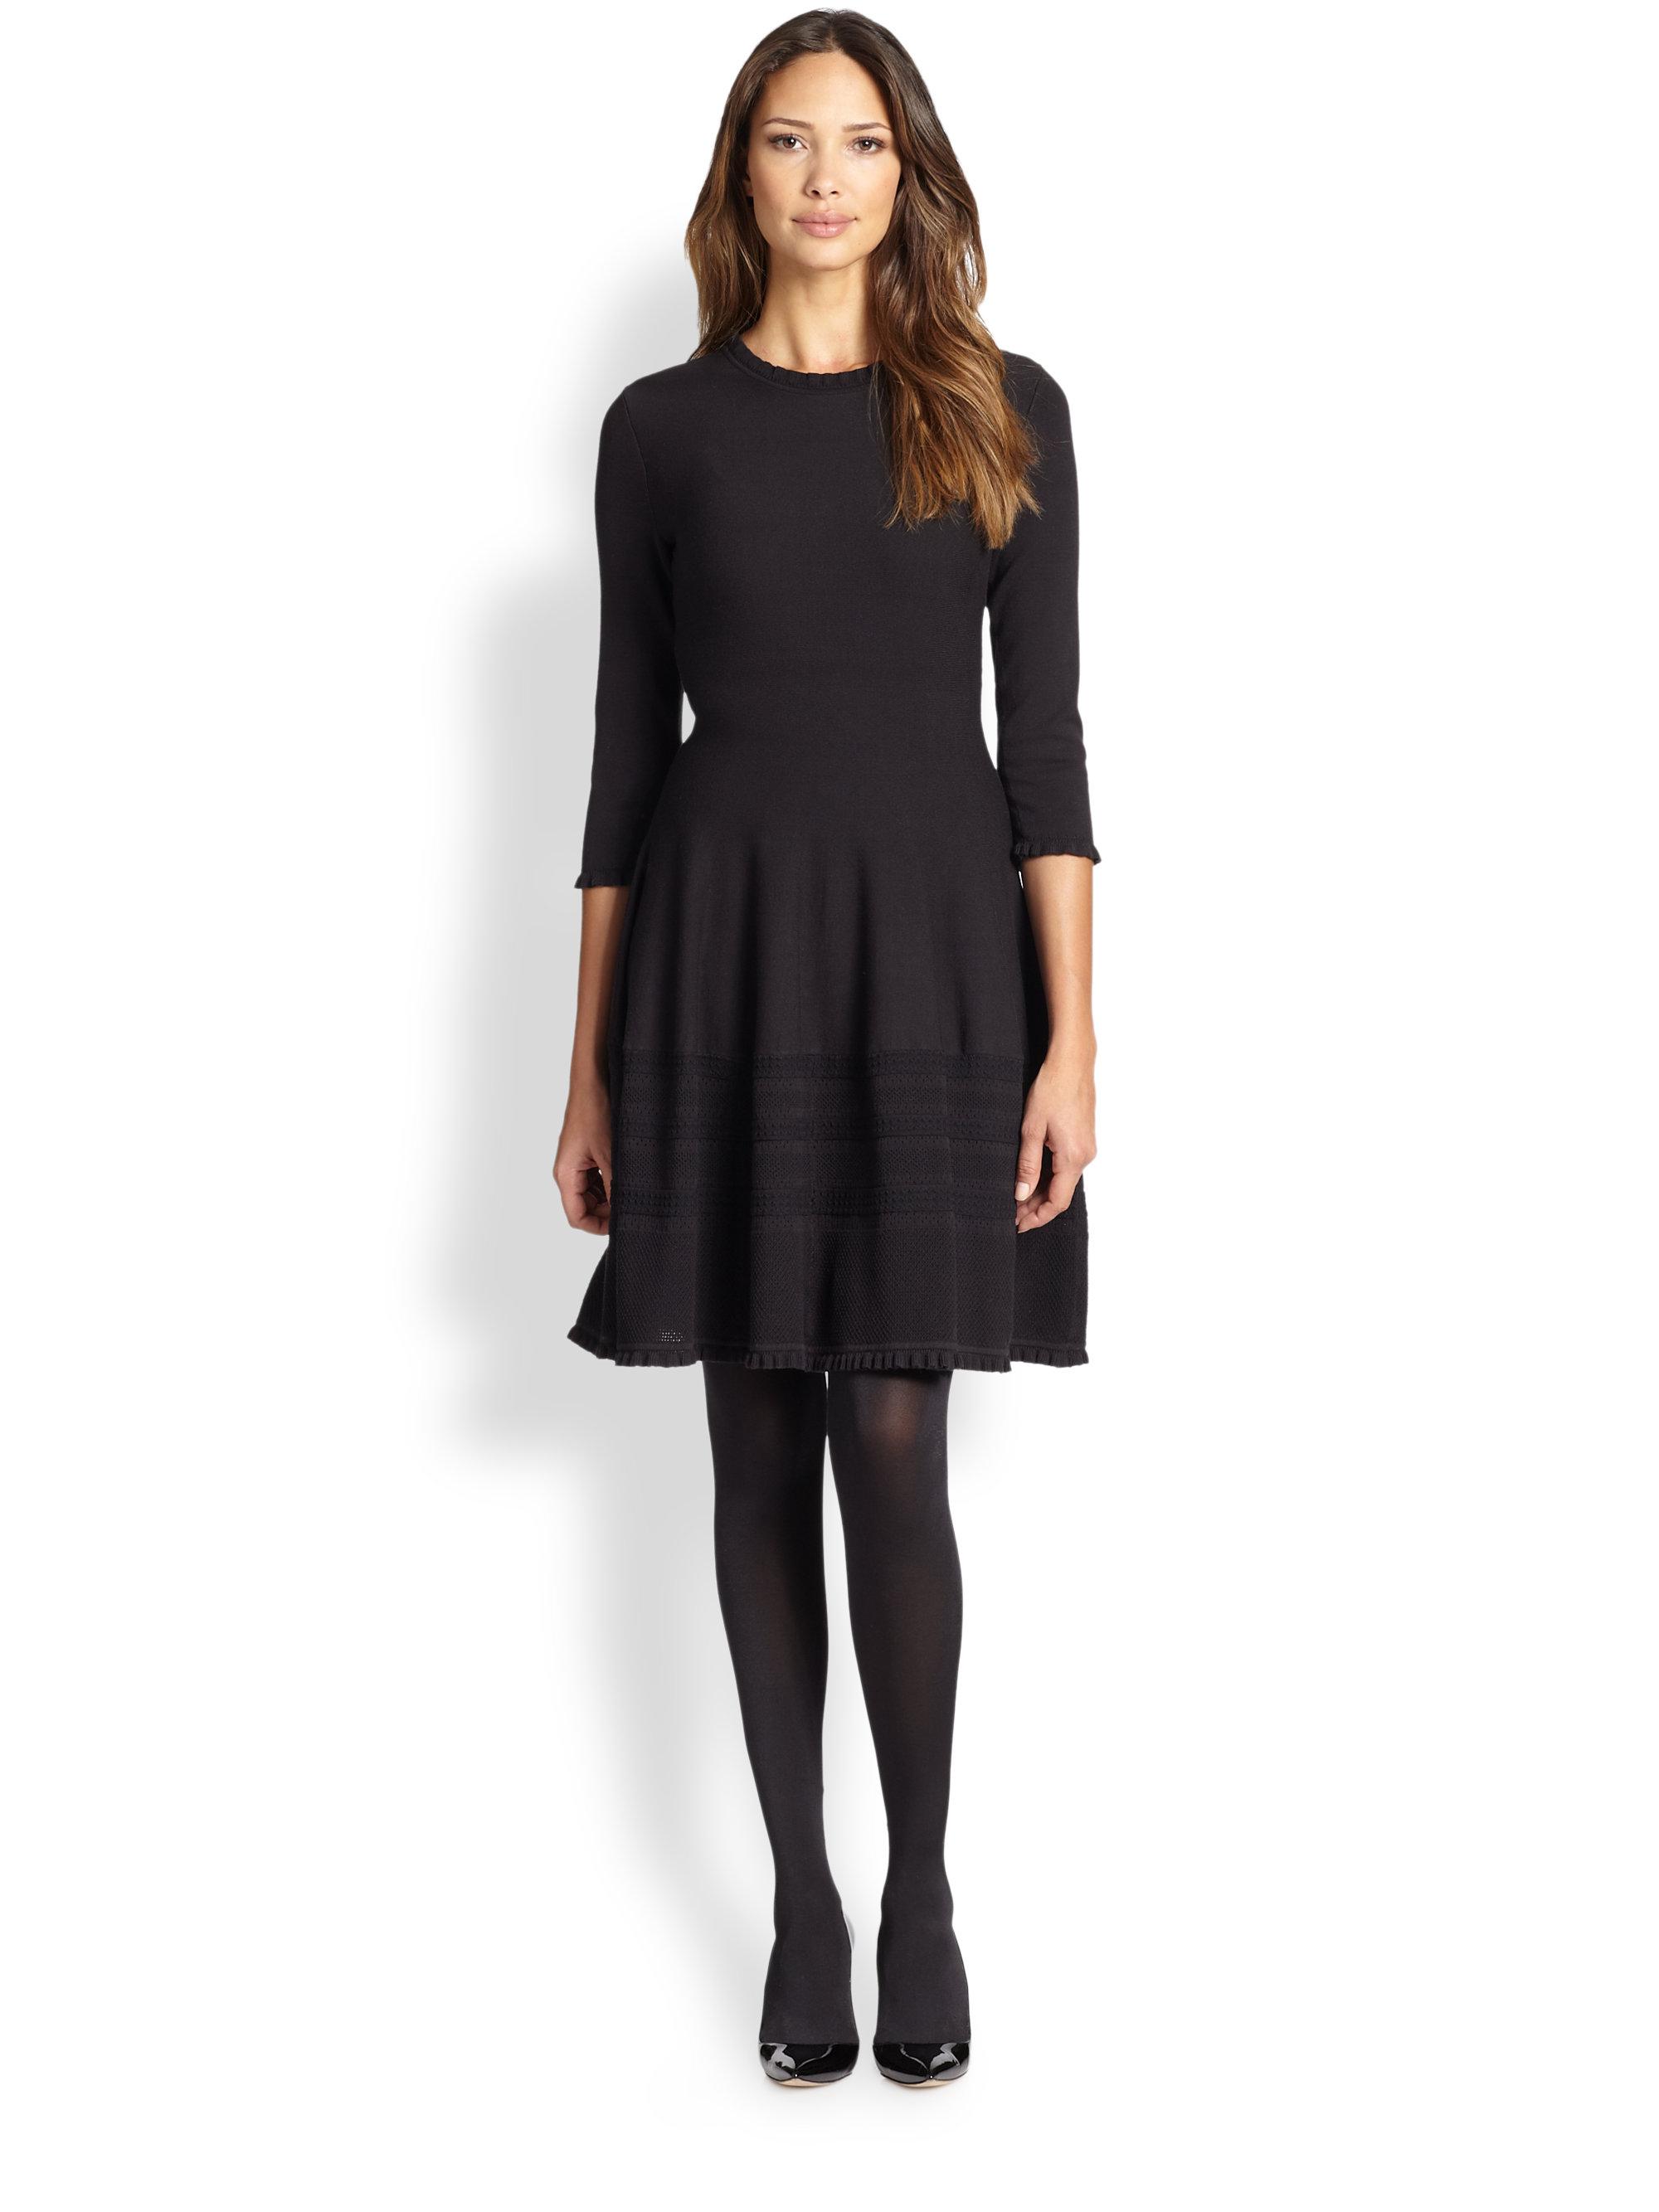 Womens Black Tunic Sweater